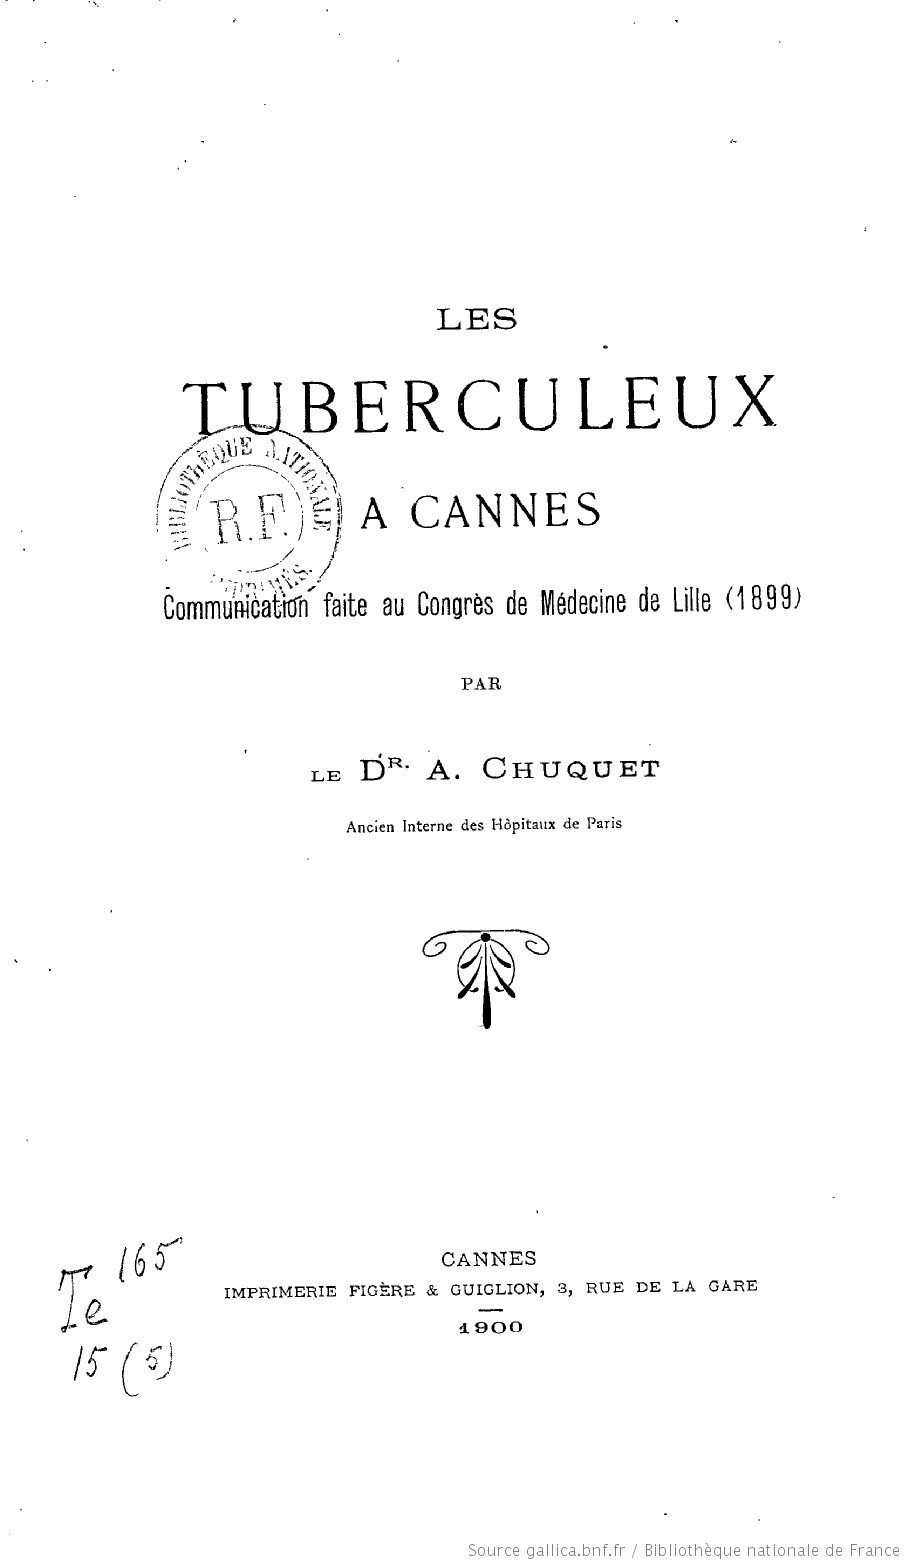 http://gallica.bnf.fr/ark:/12148/bpt6k5851837d.thumbnail.highres.jpg